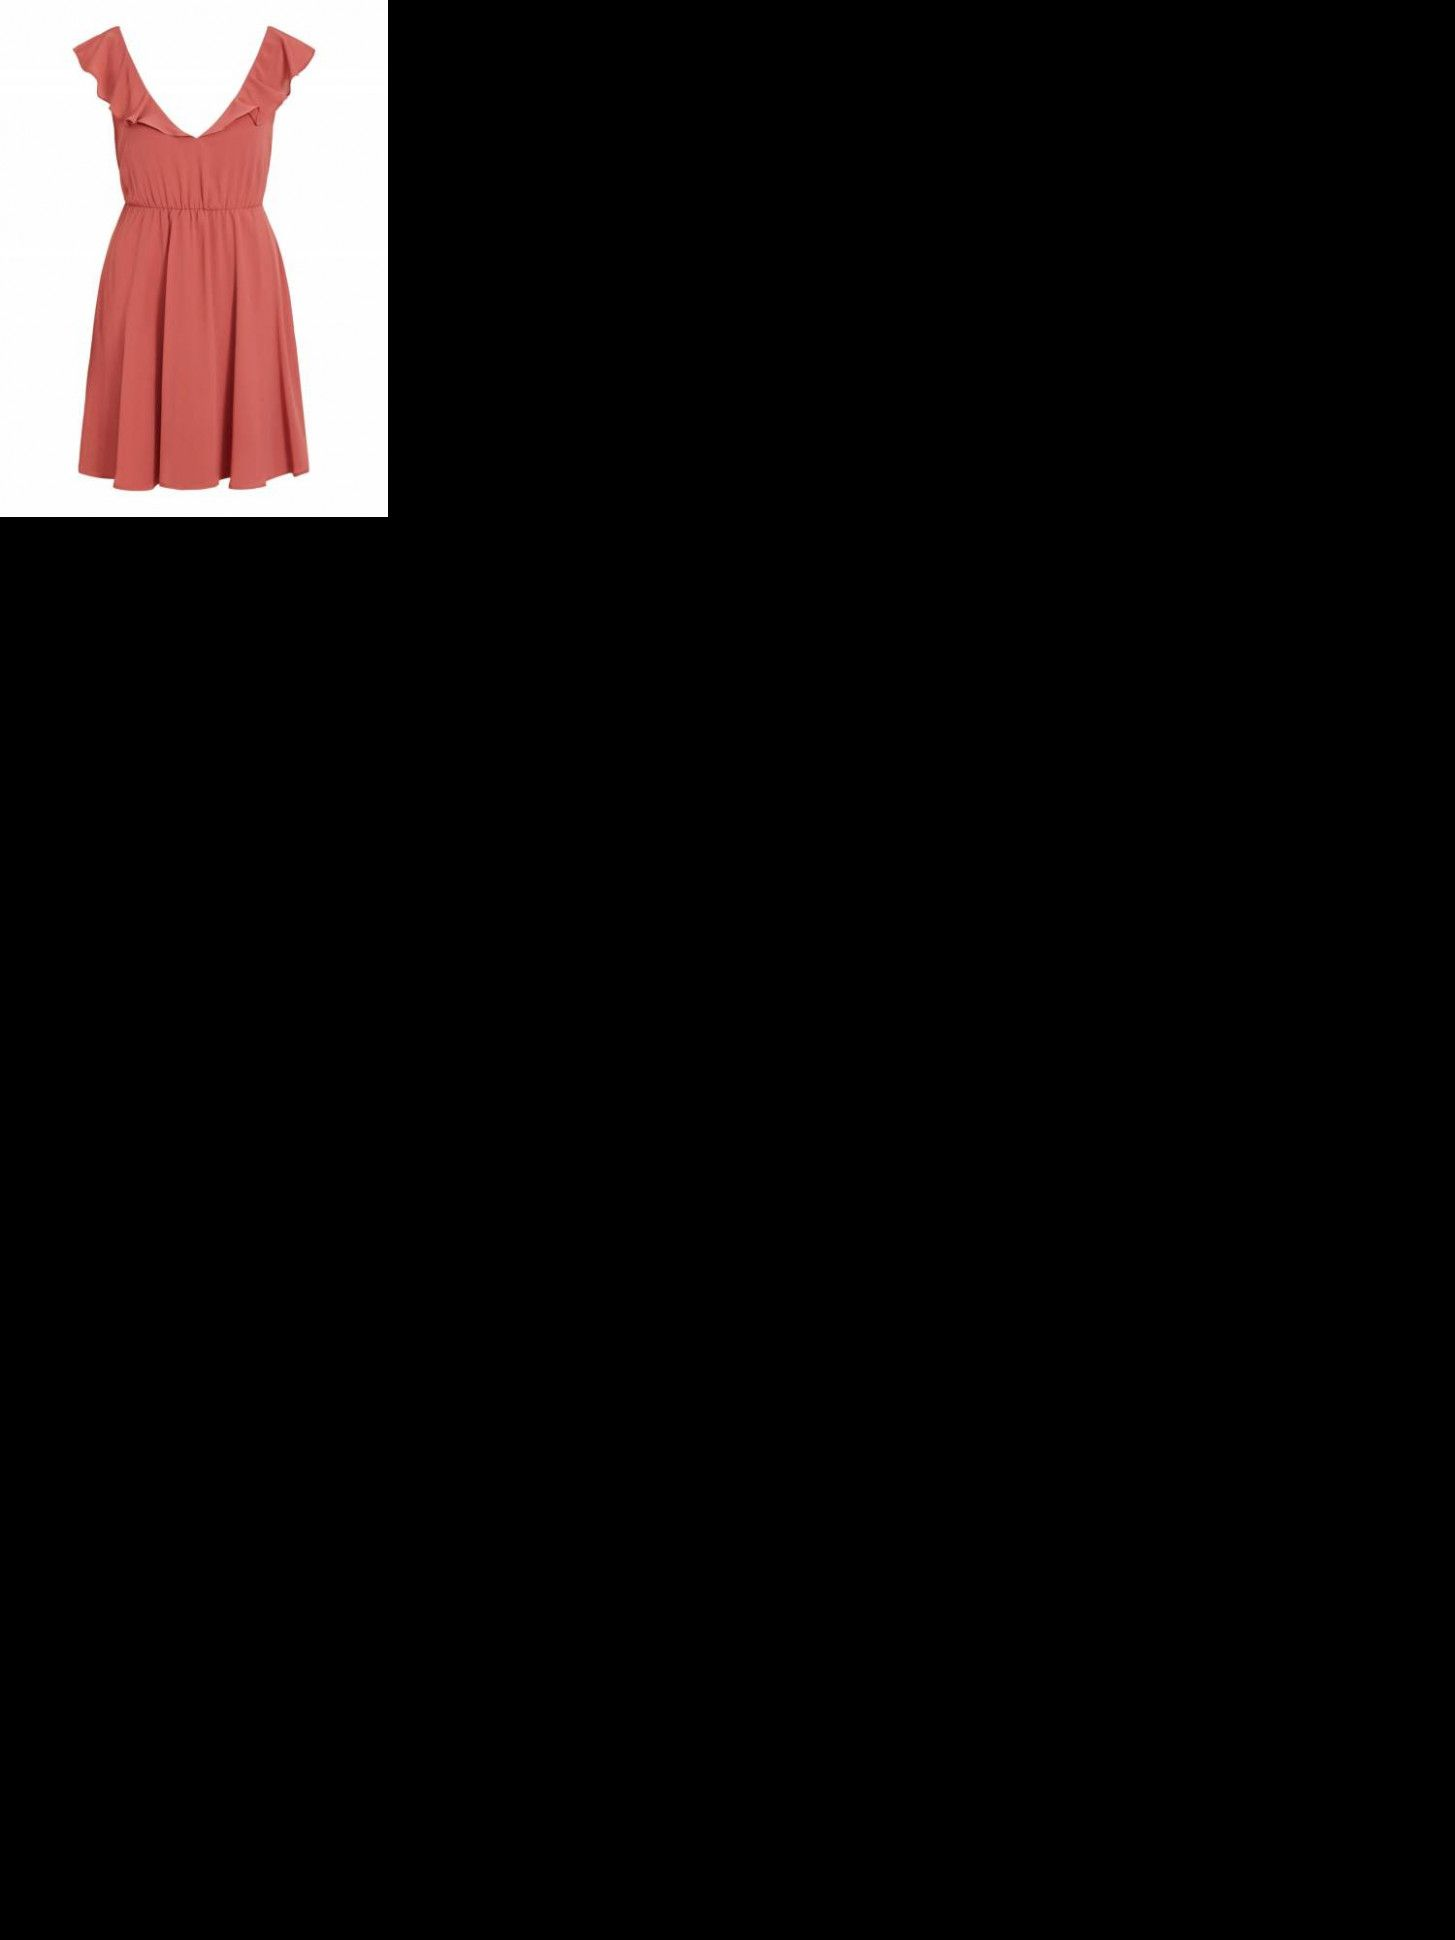 15 kleidergröße 44 in 2020 | kleid 34, kleidergrößen, kleider